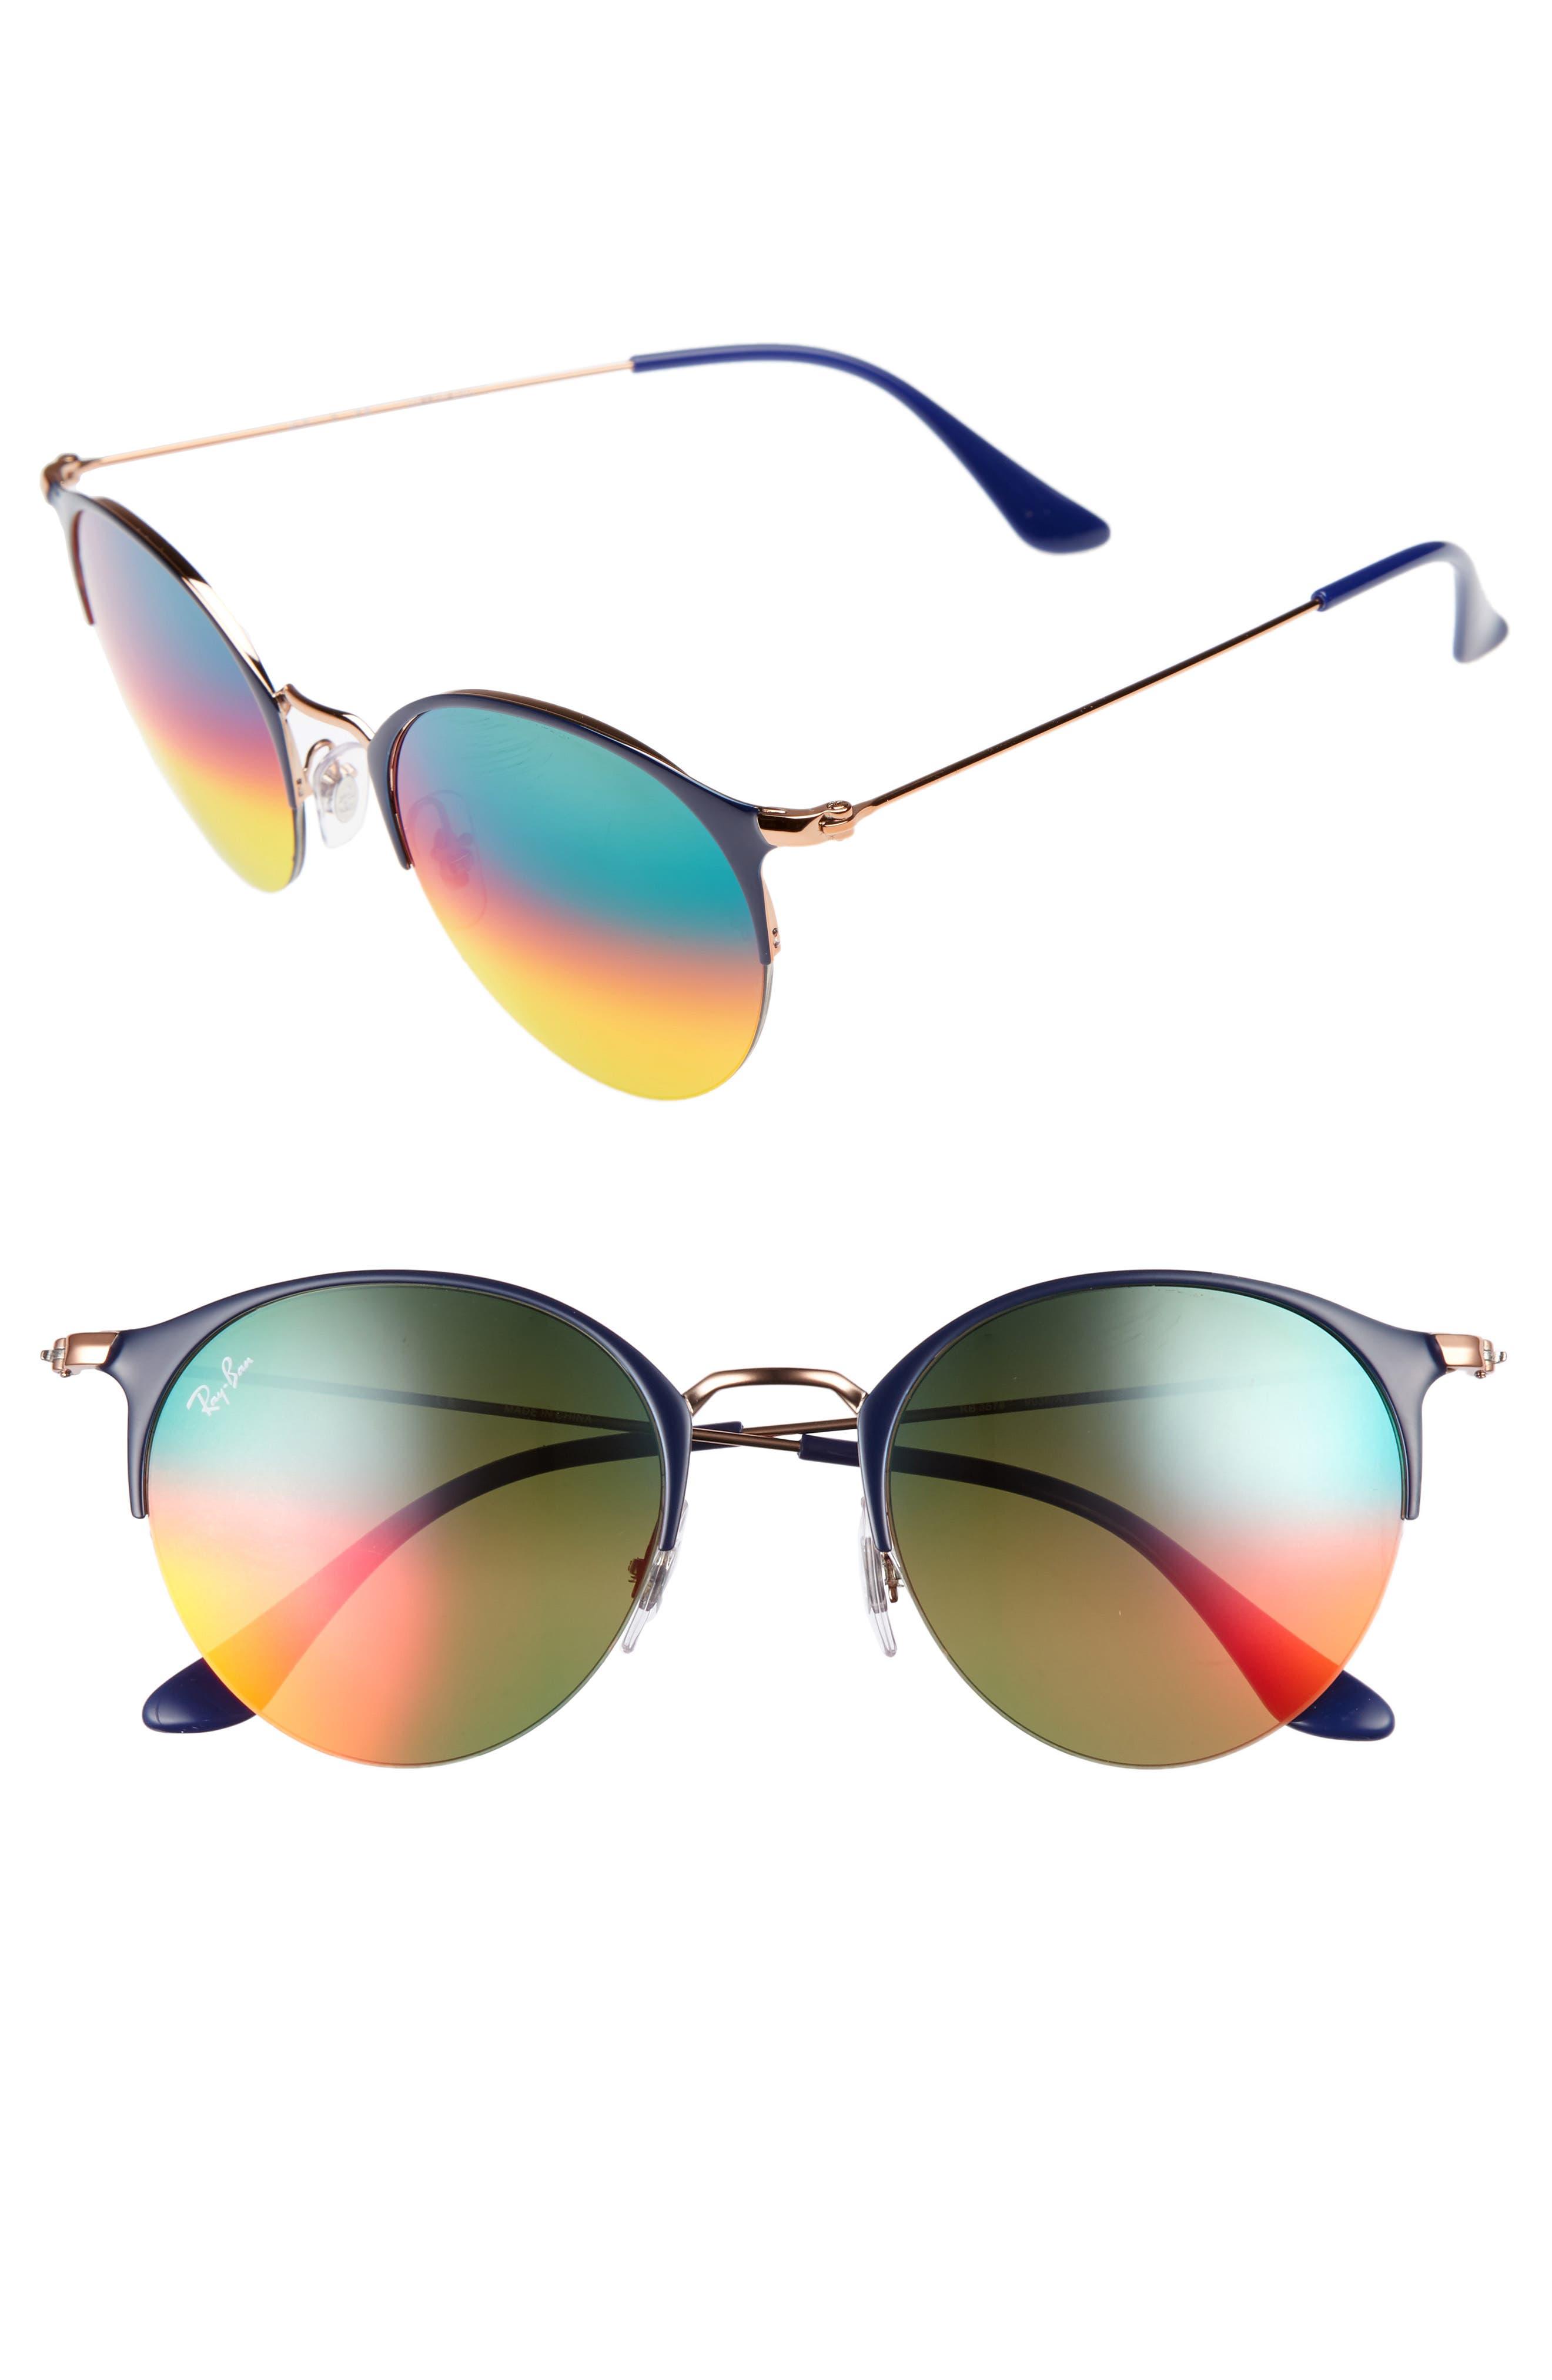 50mm Gradient Mirrored Sunglasses,                             Main thumbnail 2, color,